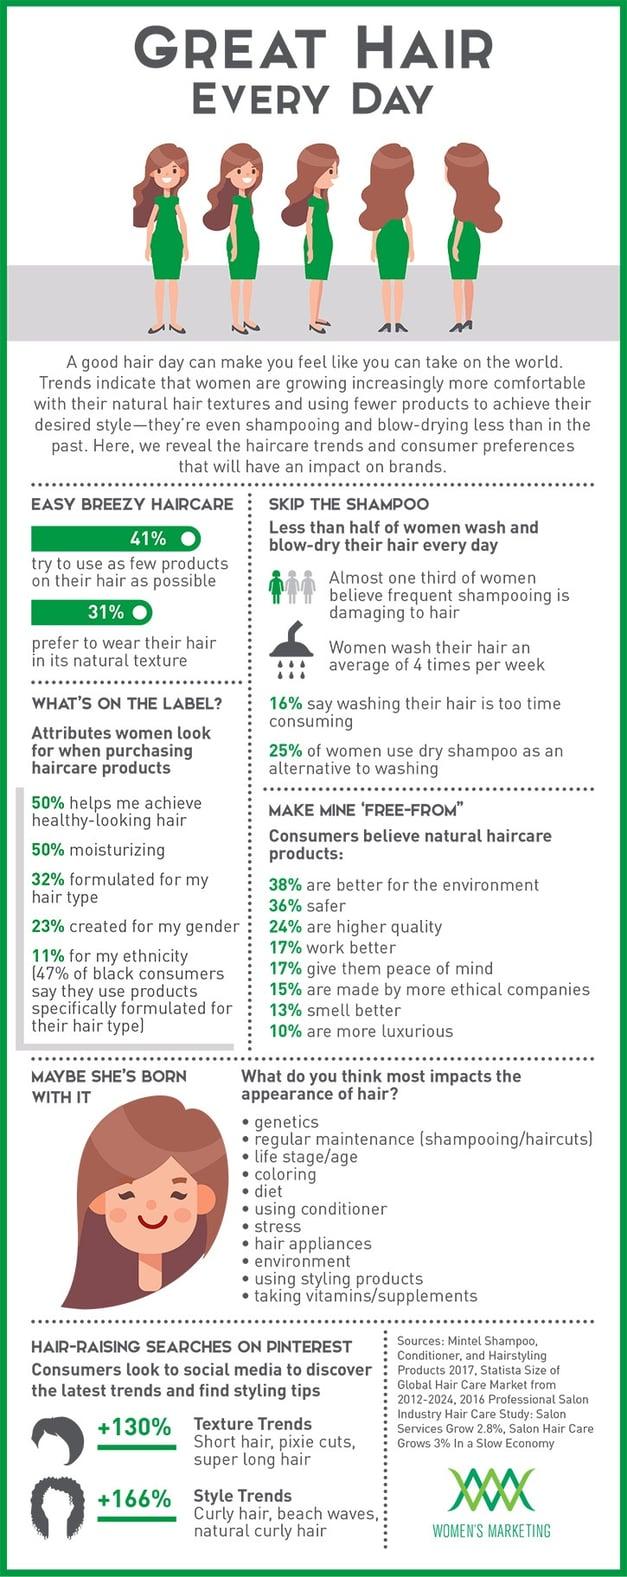 GreatHairEveryDay_Infographic.jpg